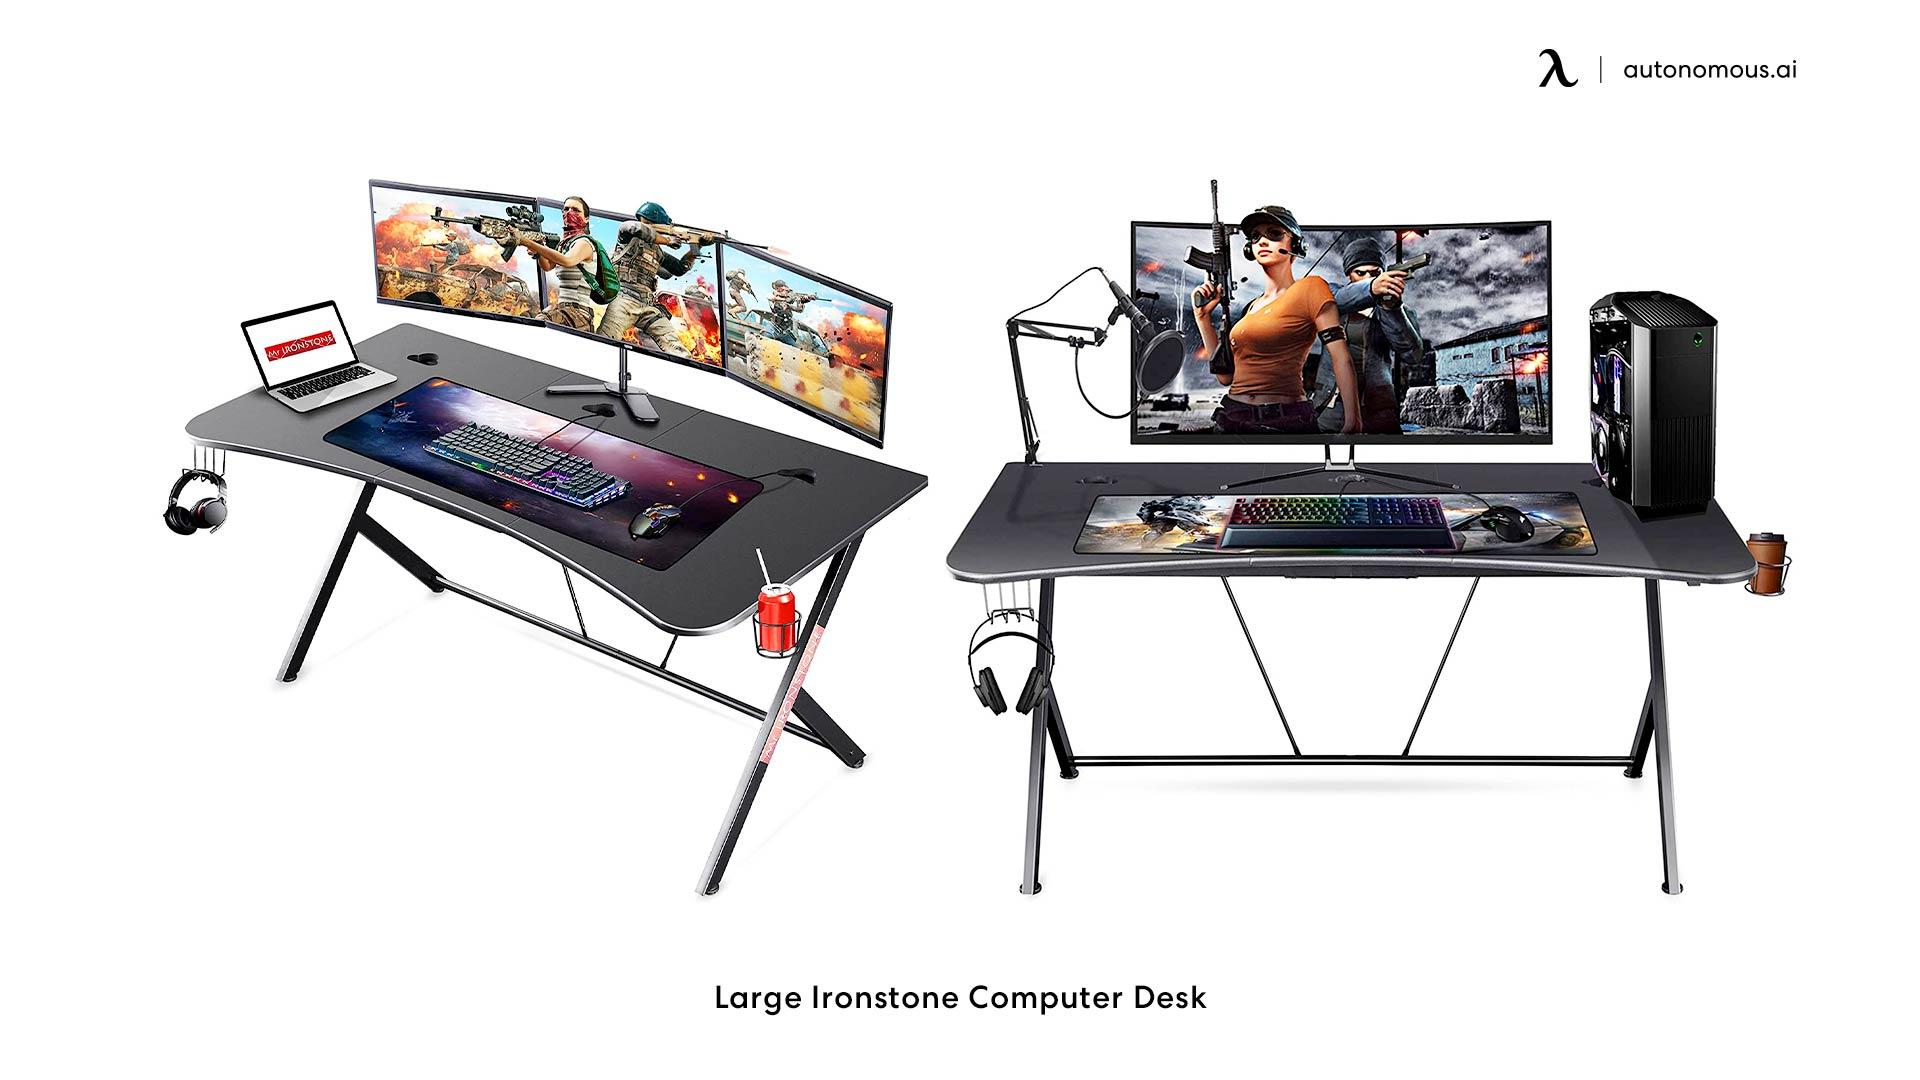 Large Ironstone Computer Desk